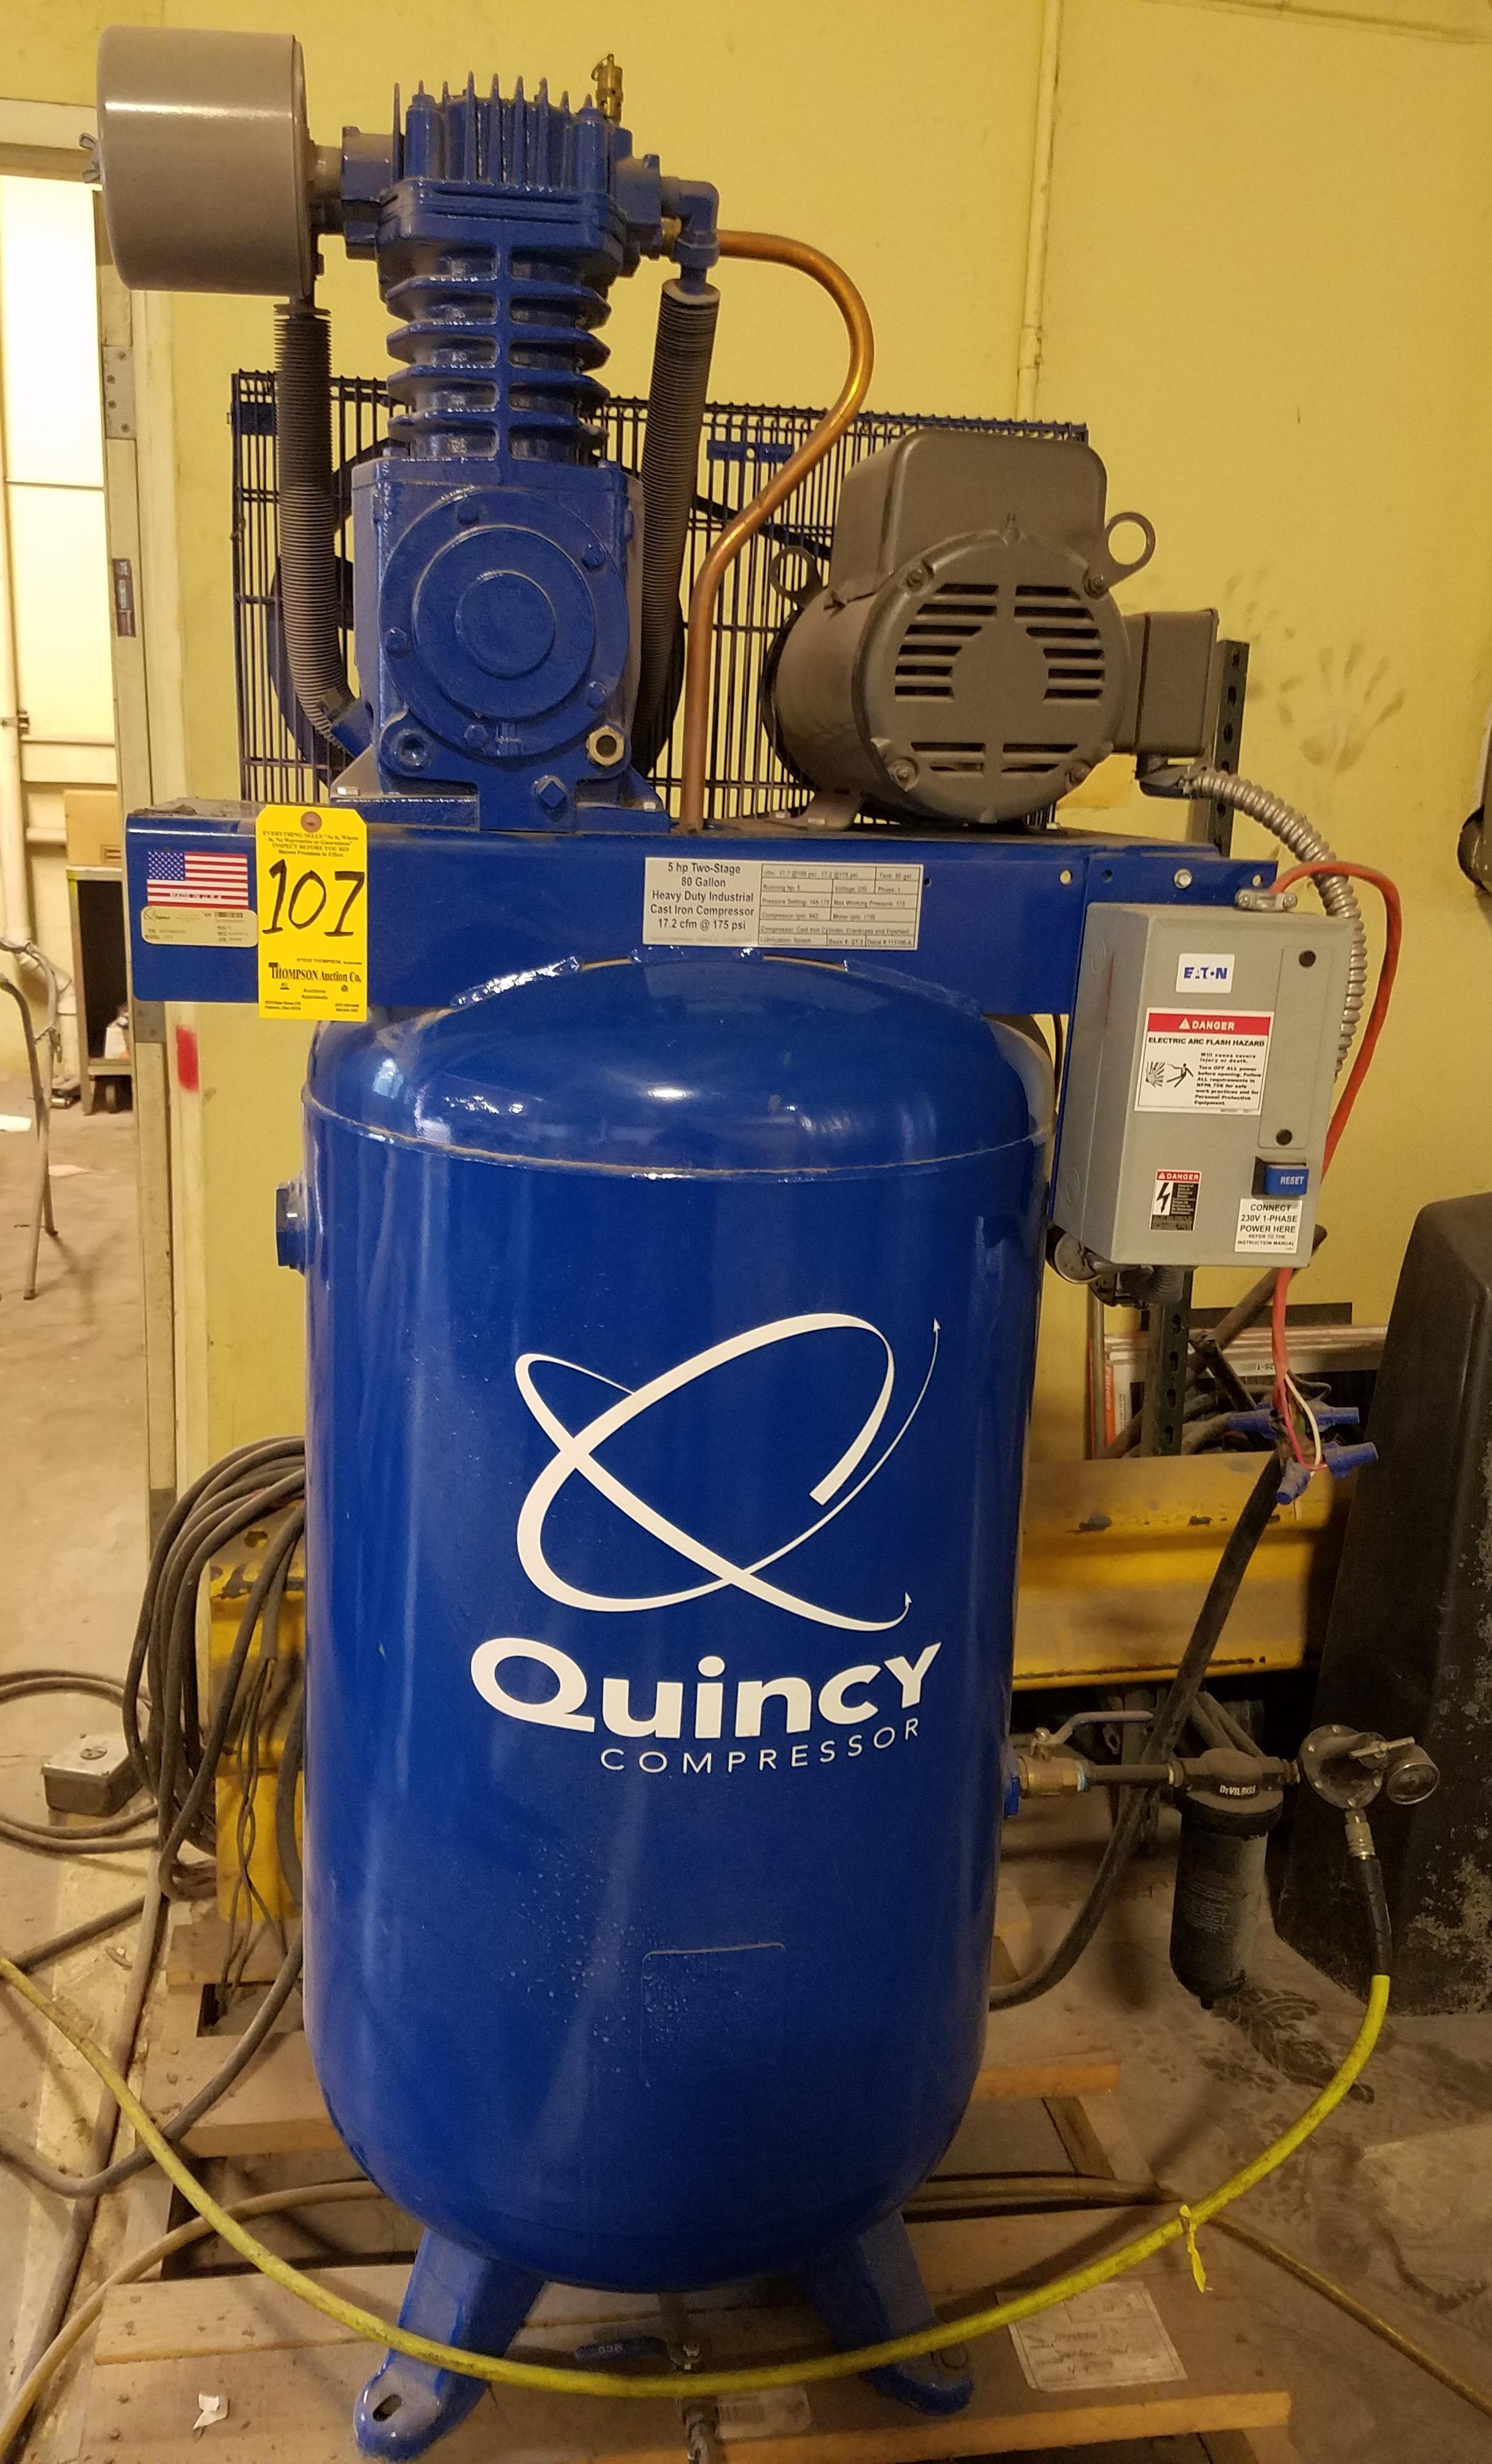 Quincy Model Qt5 2 Stage Air Compressor 5 Hp S N Qu1204040075 Schematic Pro Lot 107